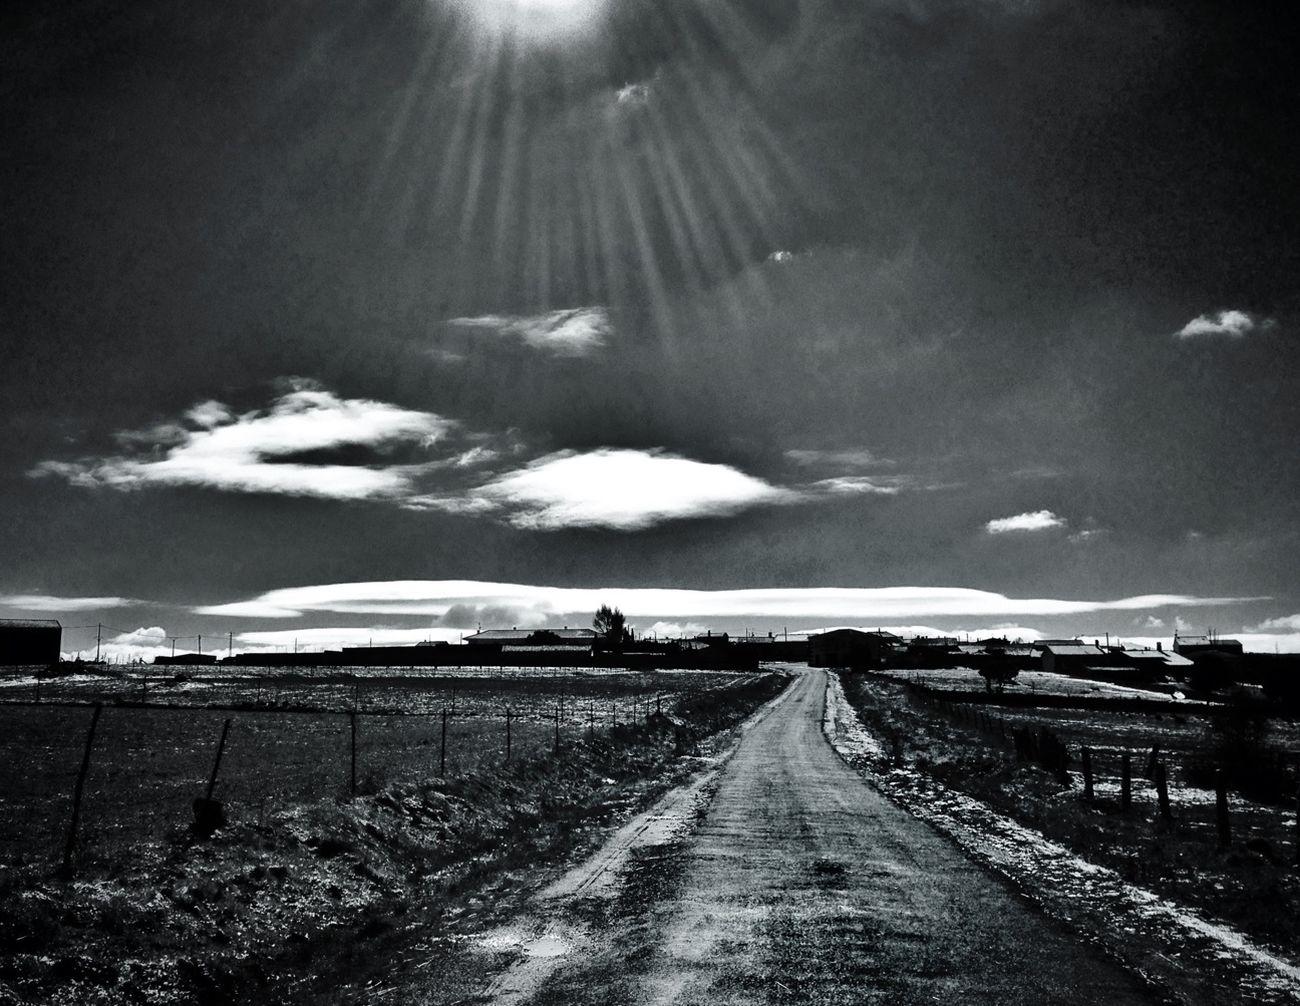 Blackandwhite Black And White Landscape Castilla Y León